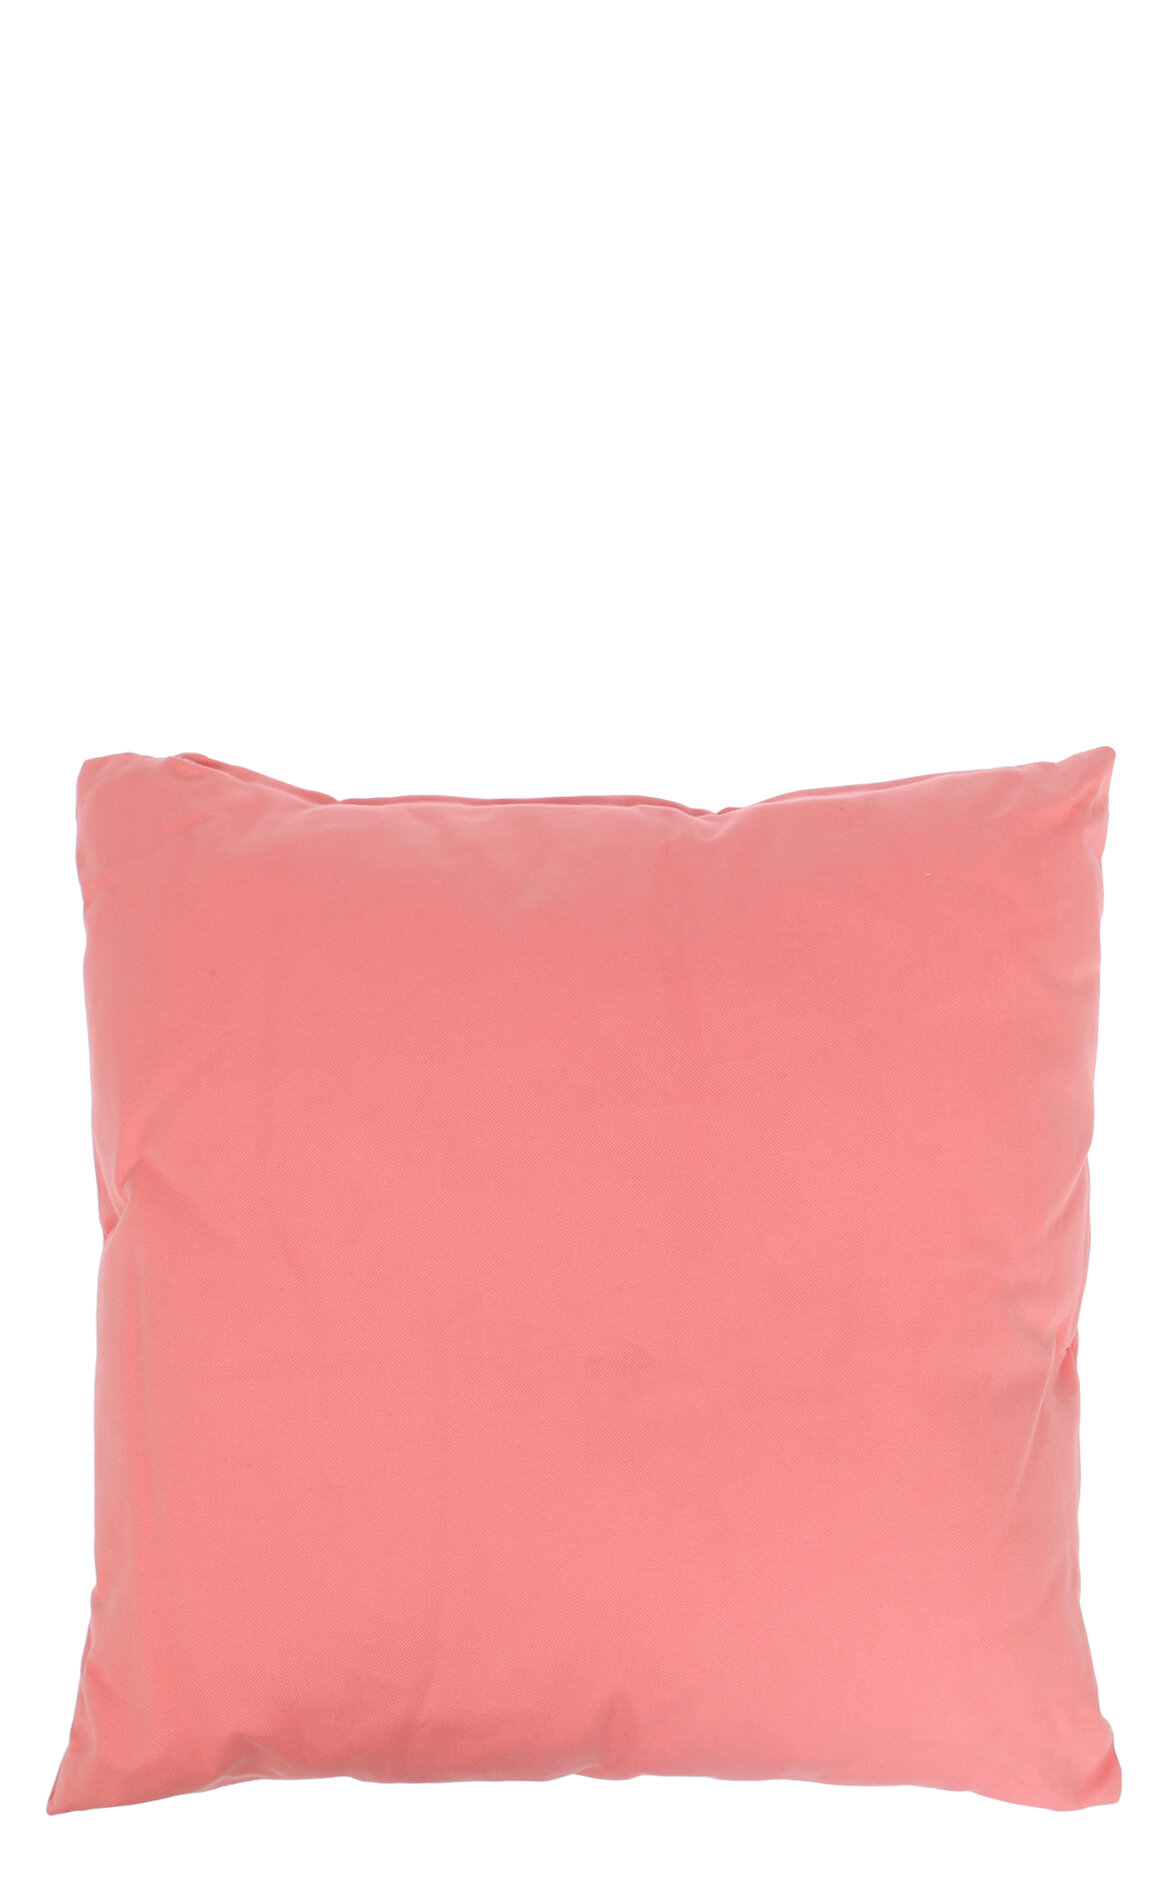 Laura Ashley-Laura Ashley Holden Pale Cranberry 45X45 cm Dekoratif Yastık